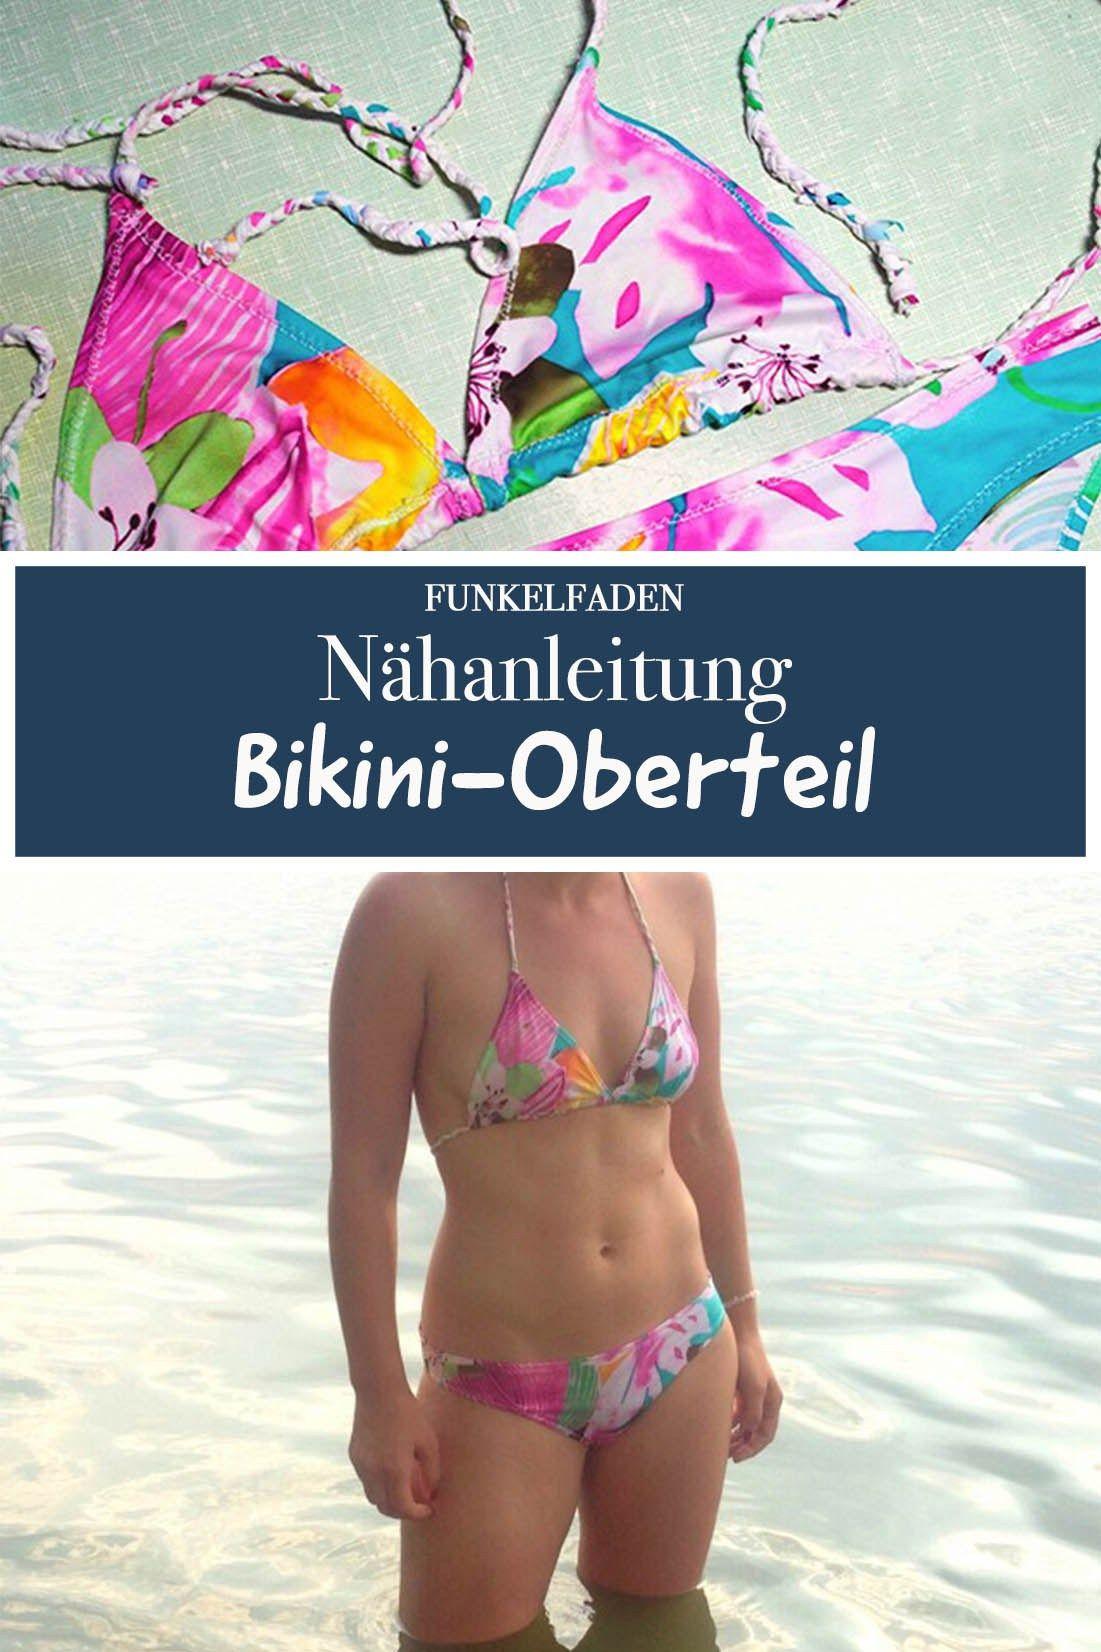 Nähanleitung Bikini-Oberteil selber nähen | Bikini-Oberteile, Bikini ...